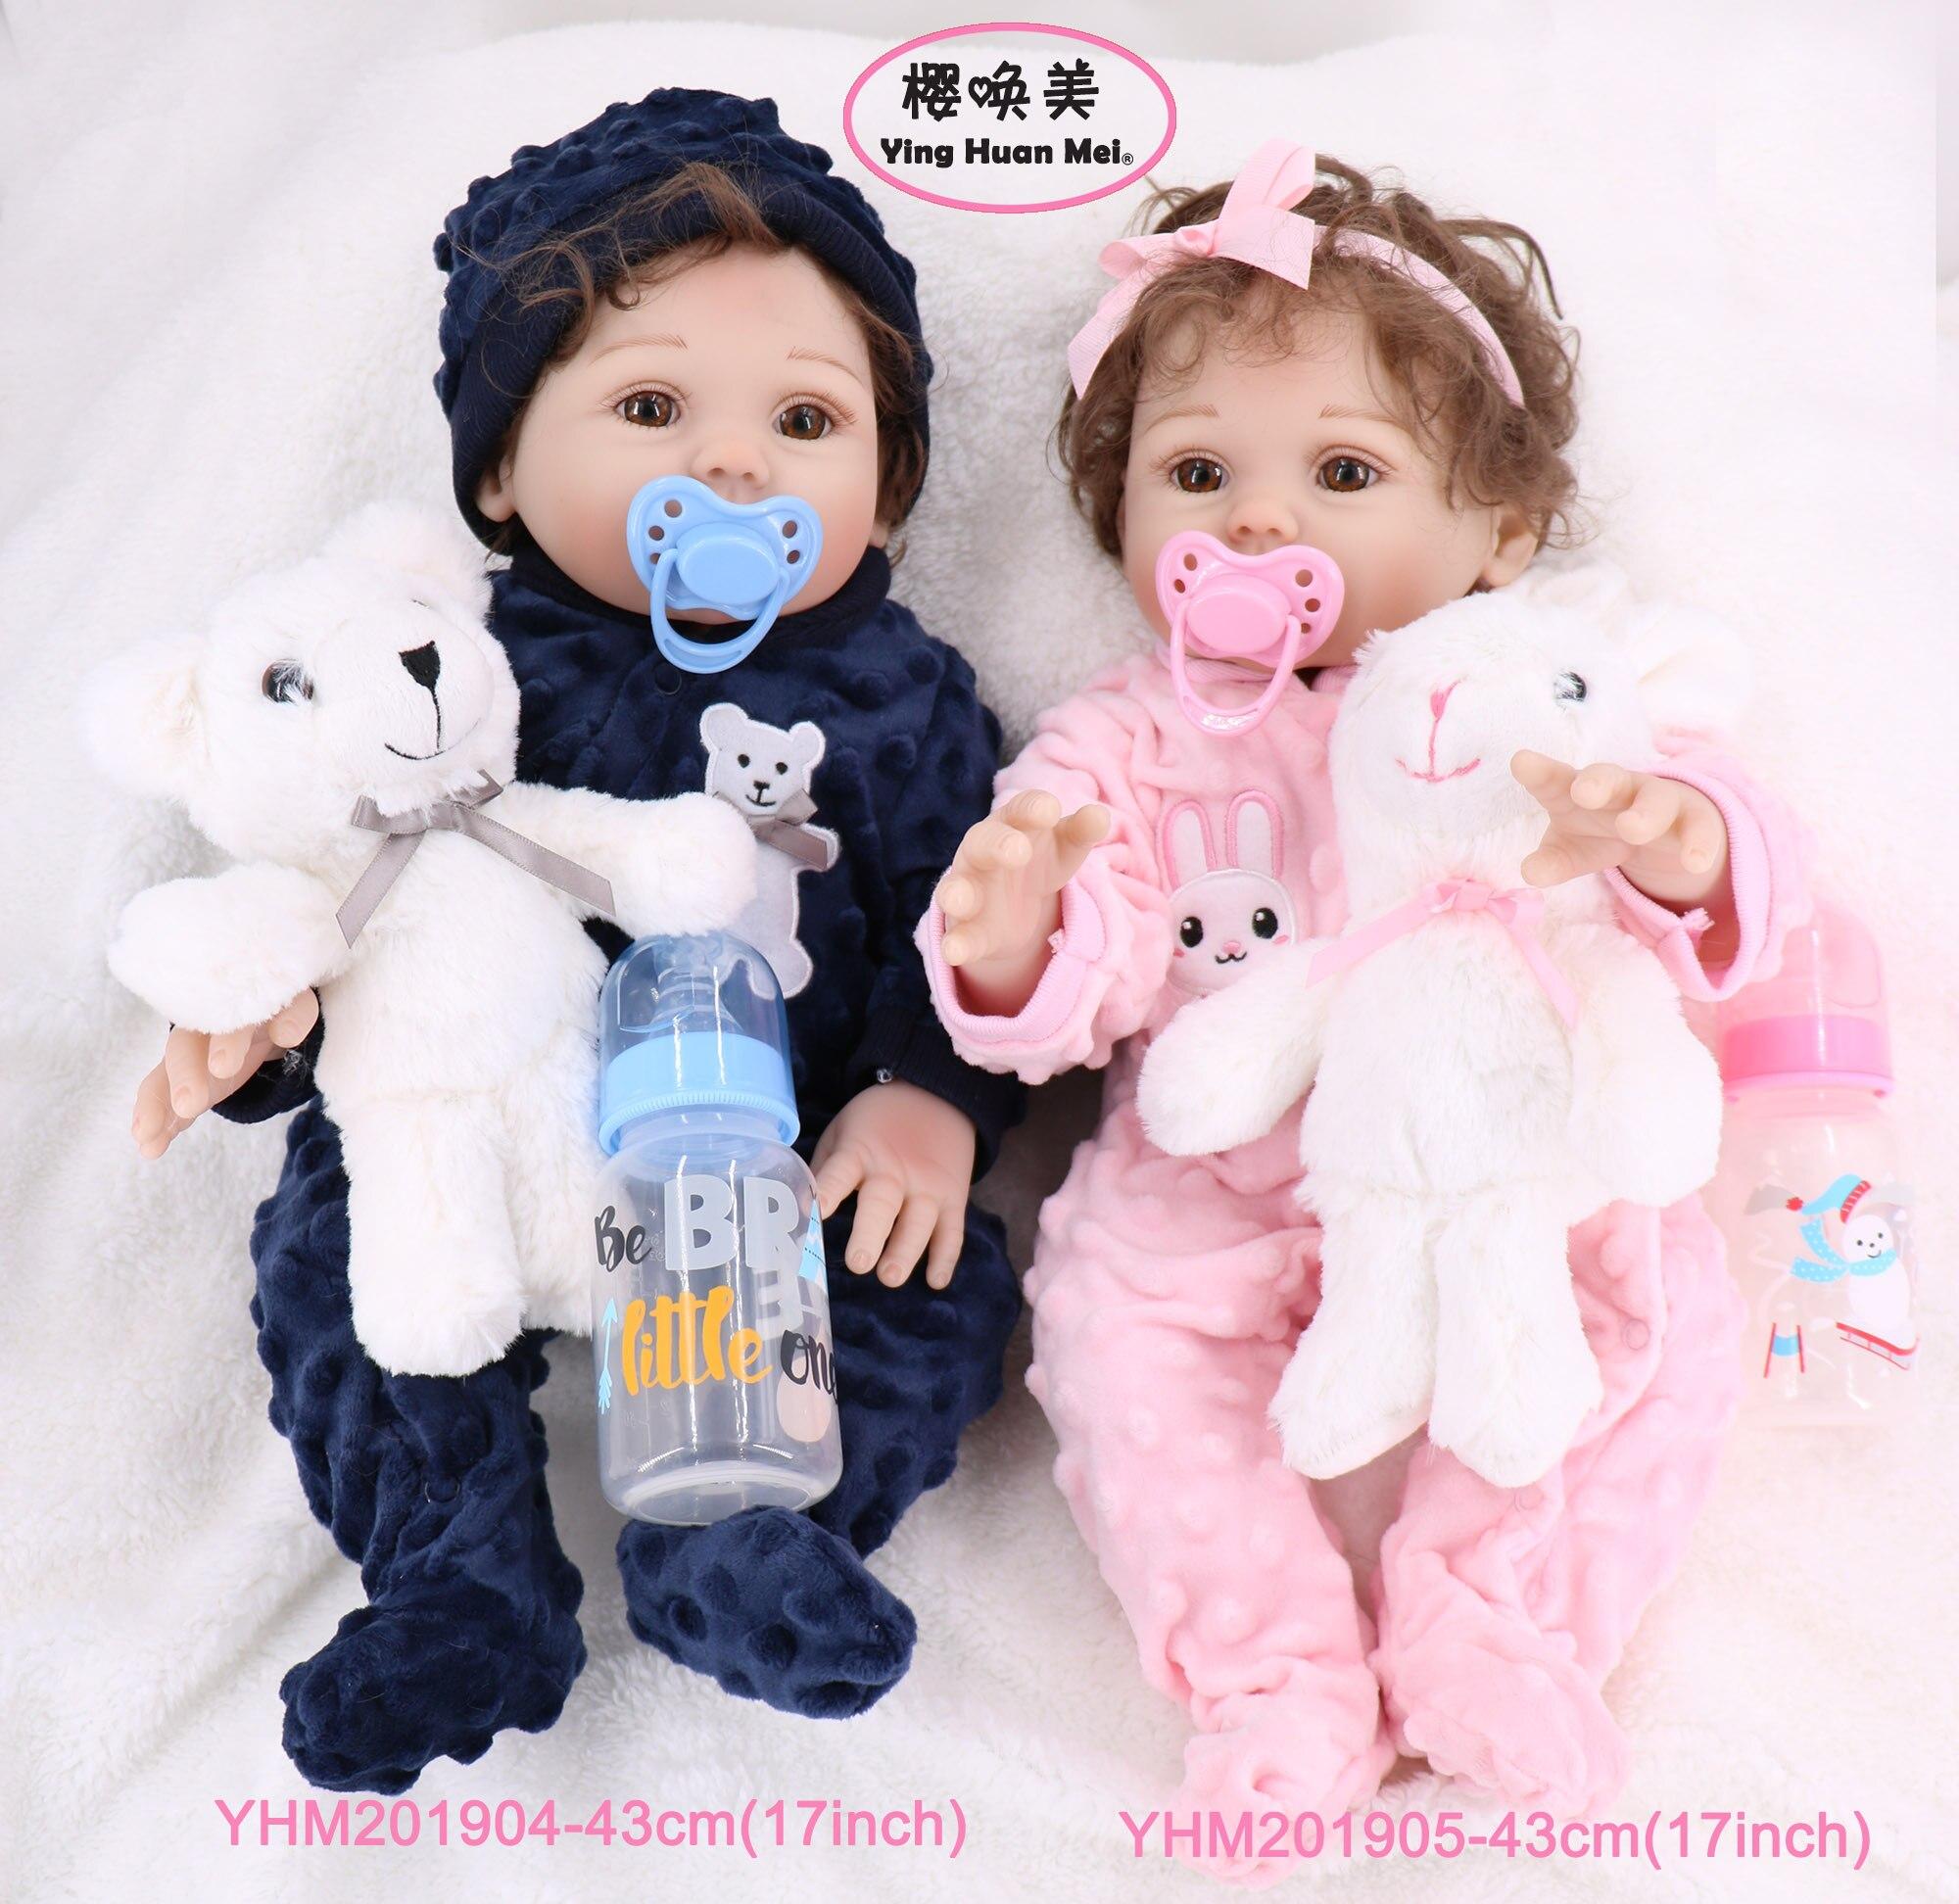 Child Reborn Full Silicone Reborn Full Silicone Body Baby Dolls Boy Girl Twin 43CM Vinyl Realistic Mini Baby Bath Toy Waterproof